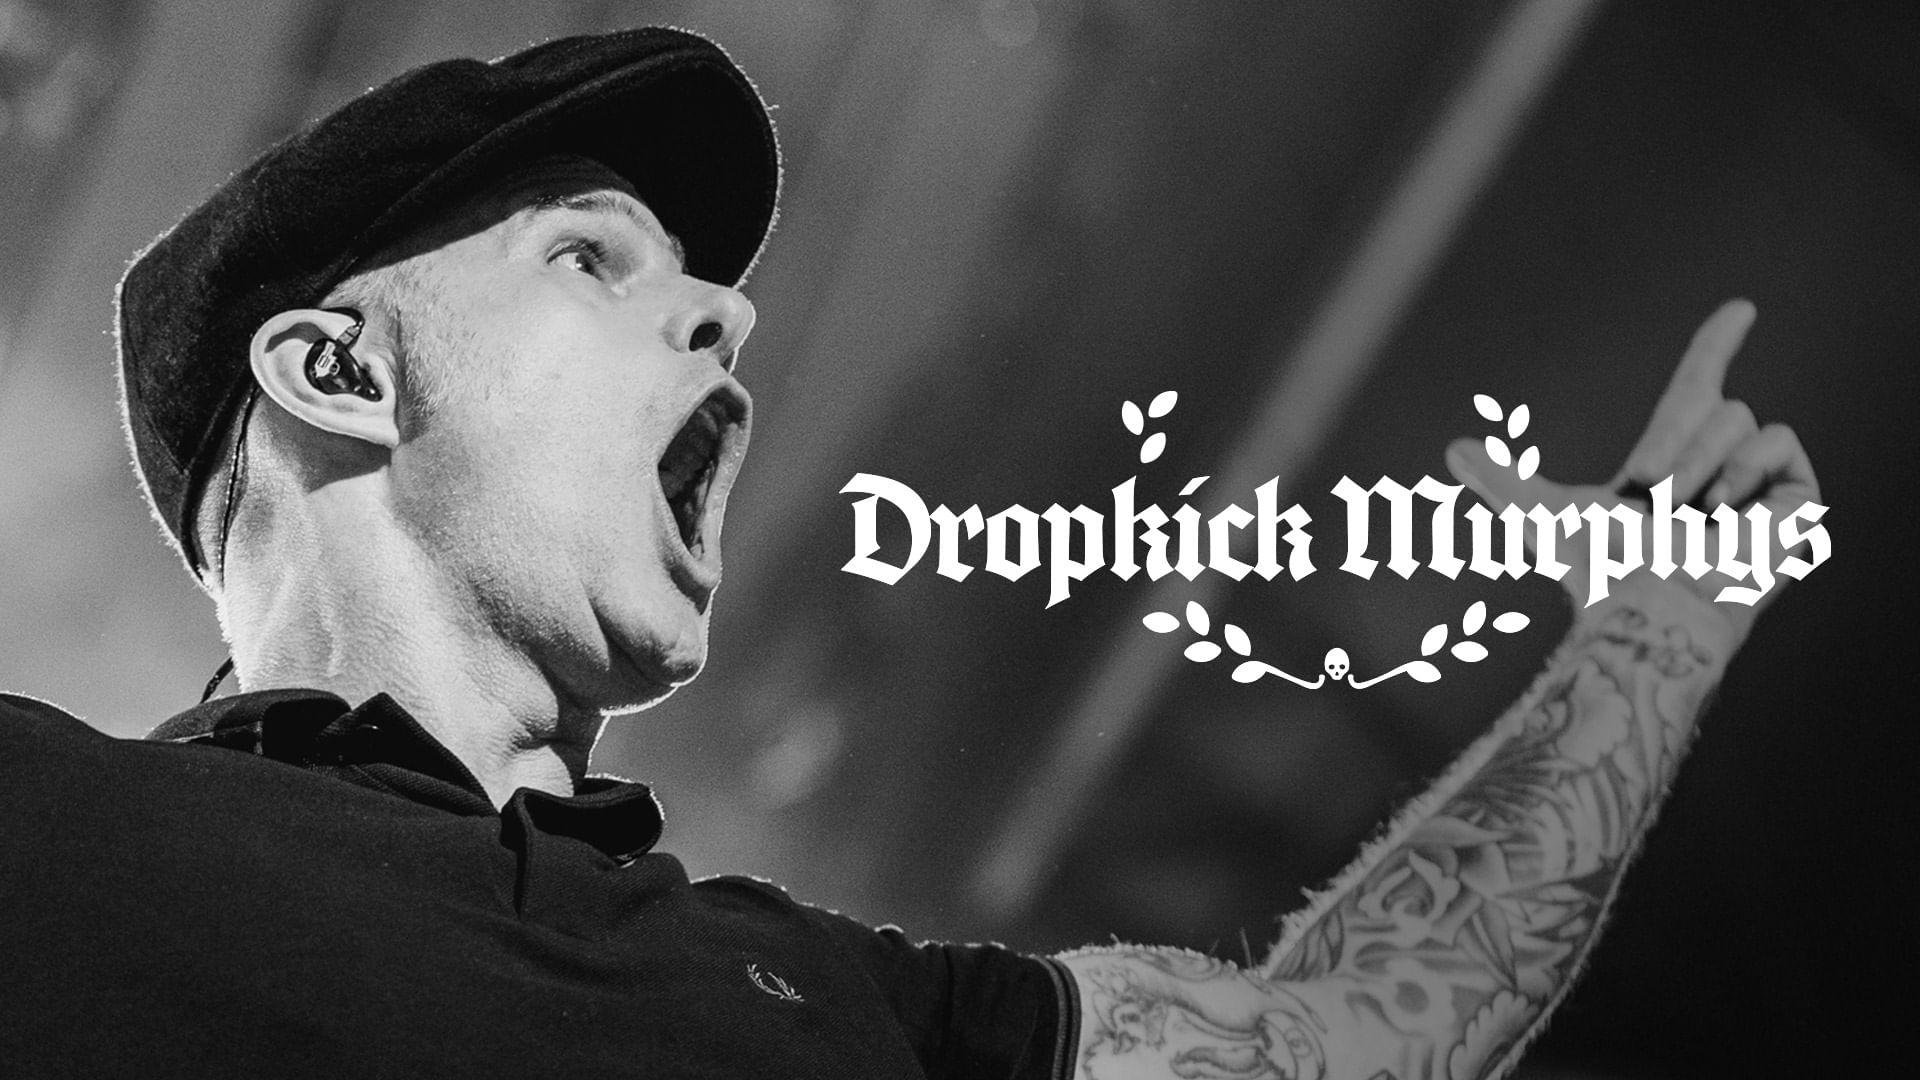 Dropkick Murphys (Hellfest 2012)